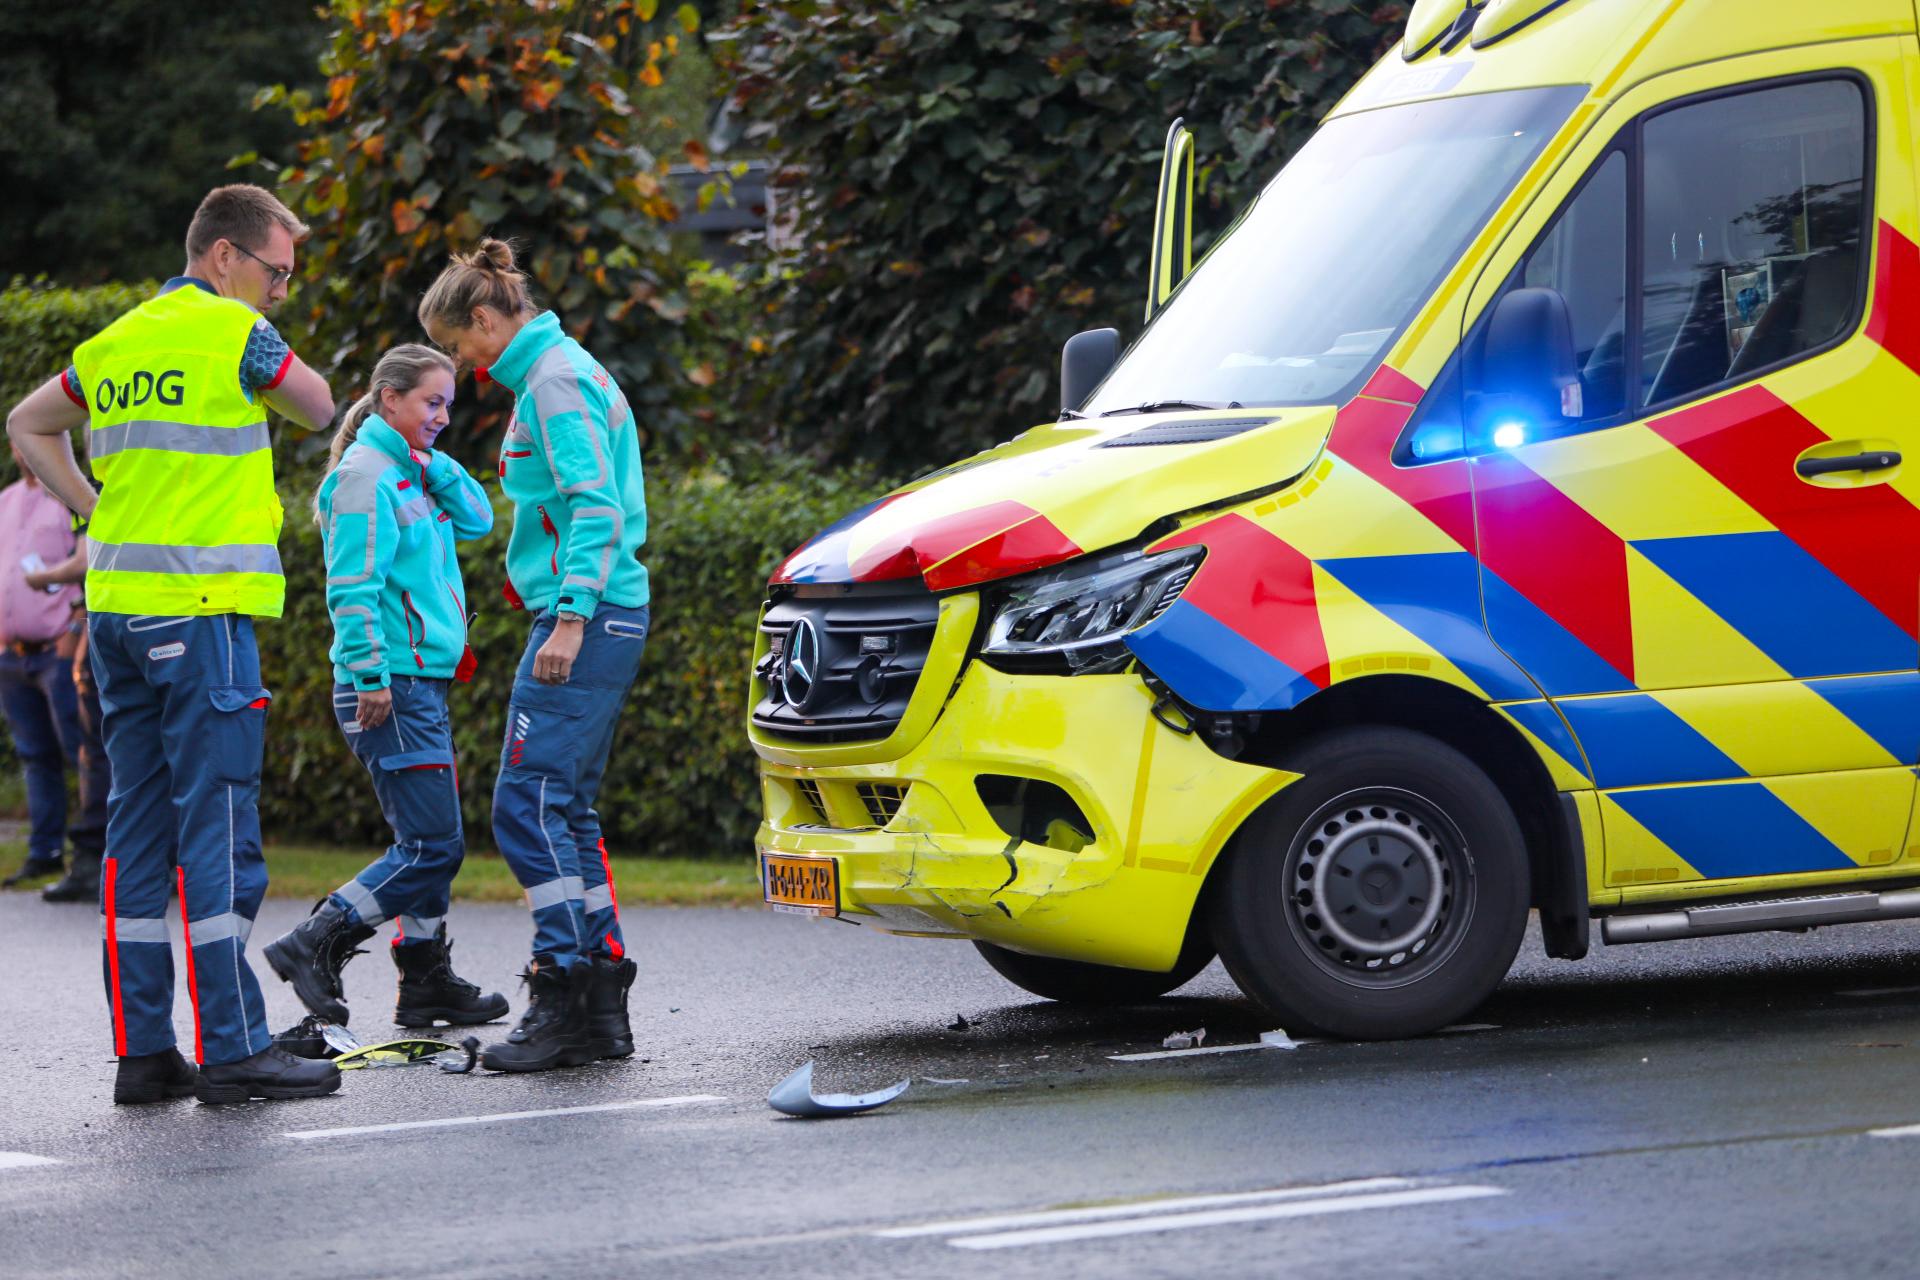 Ambulance botst op auto tijdens spoedrit